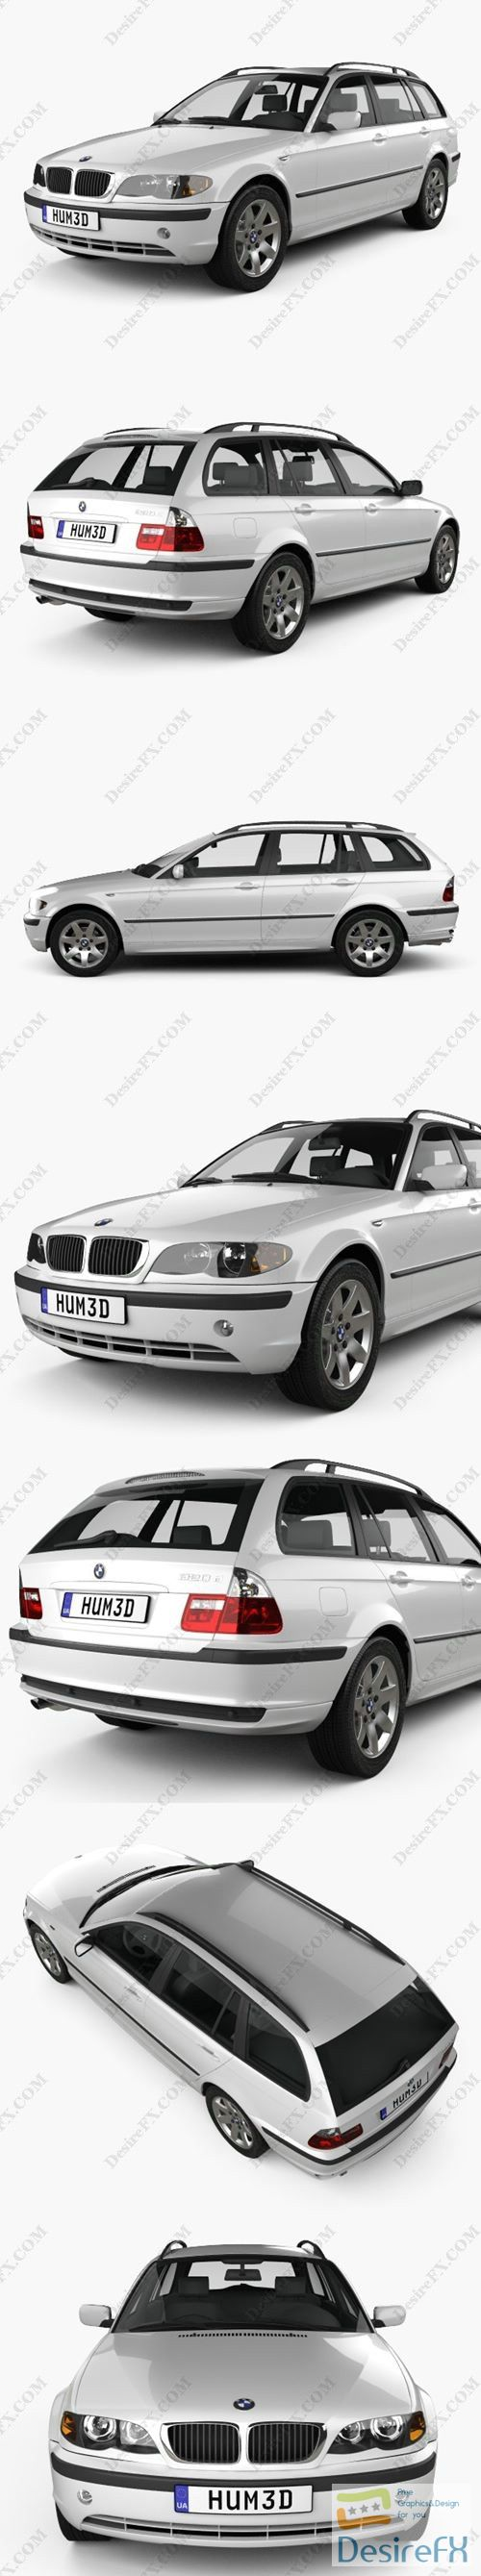 BMW 3 Series touring 2001 3D Model